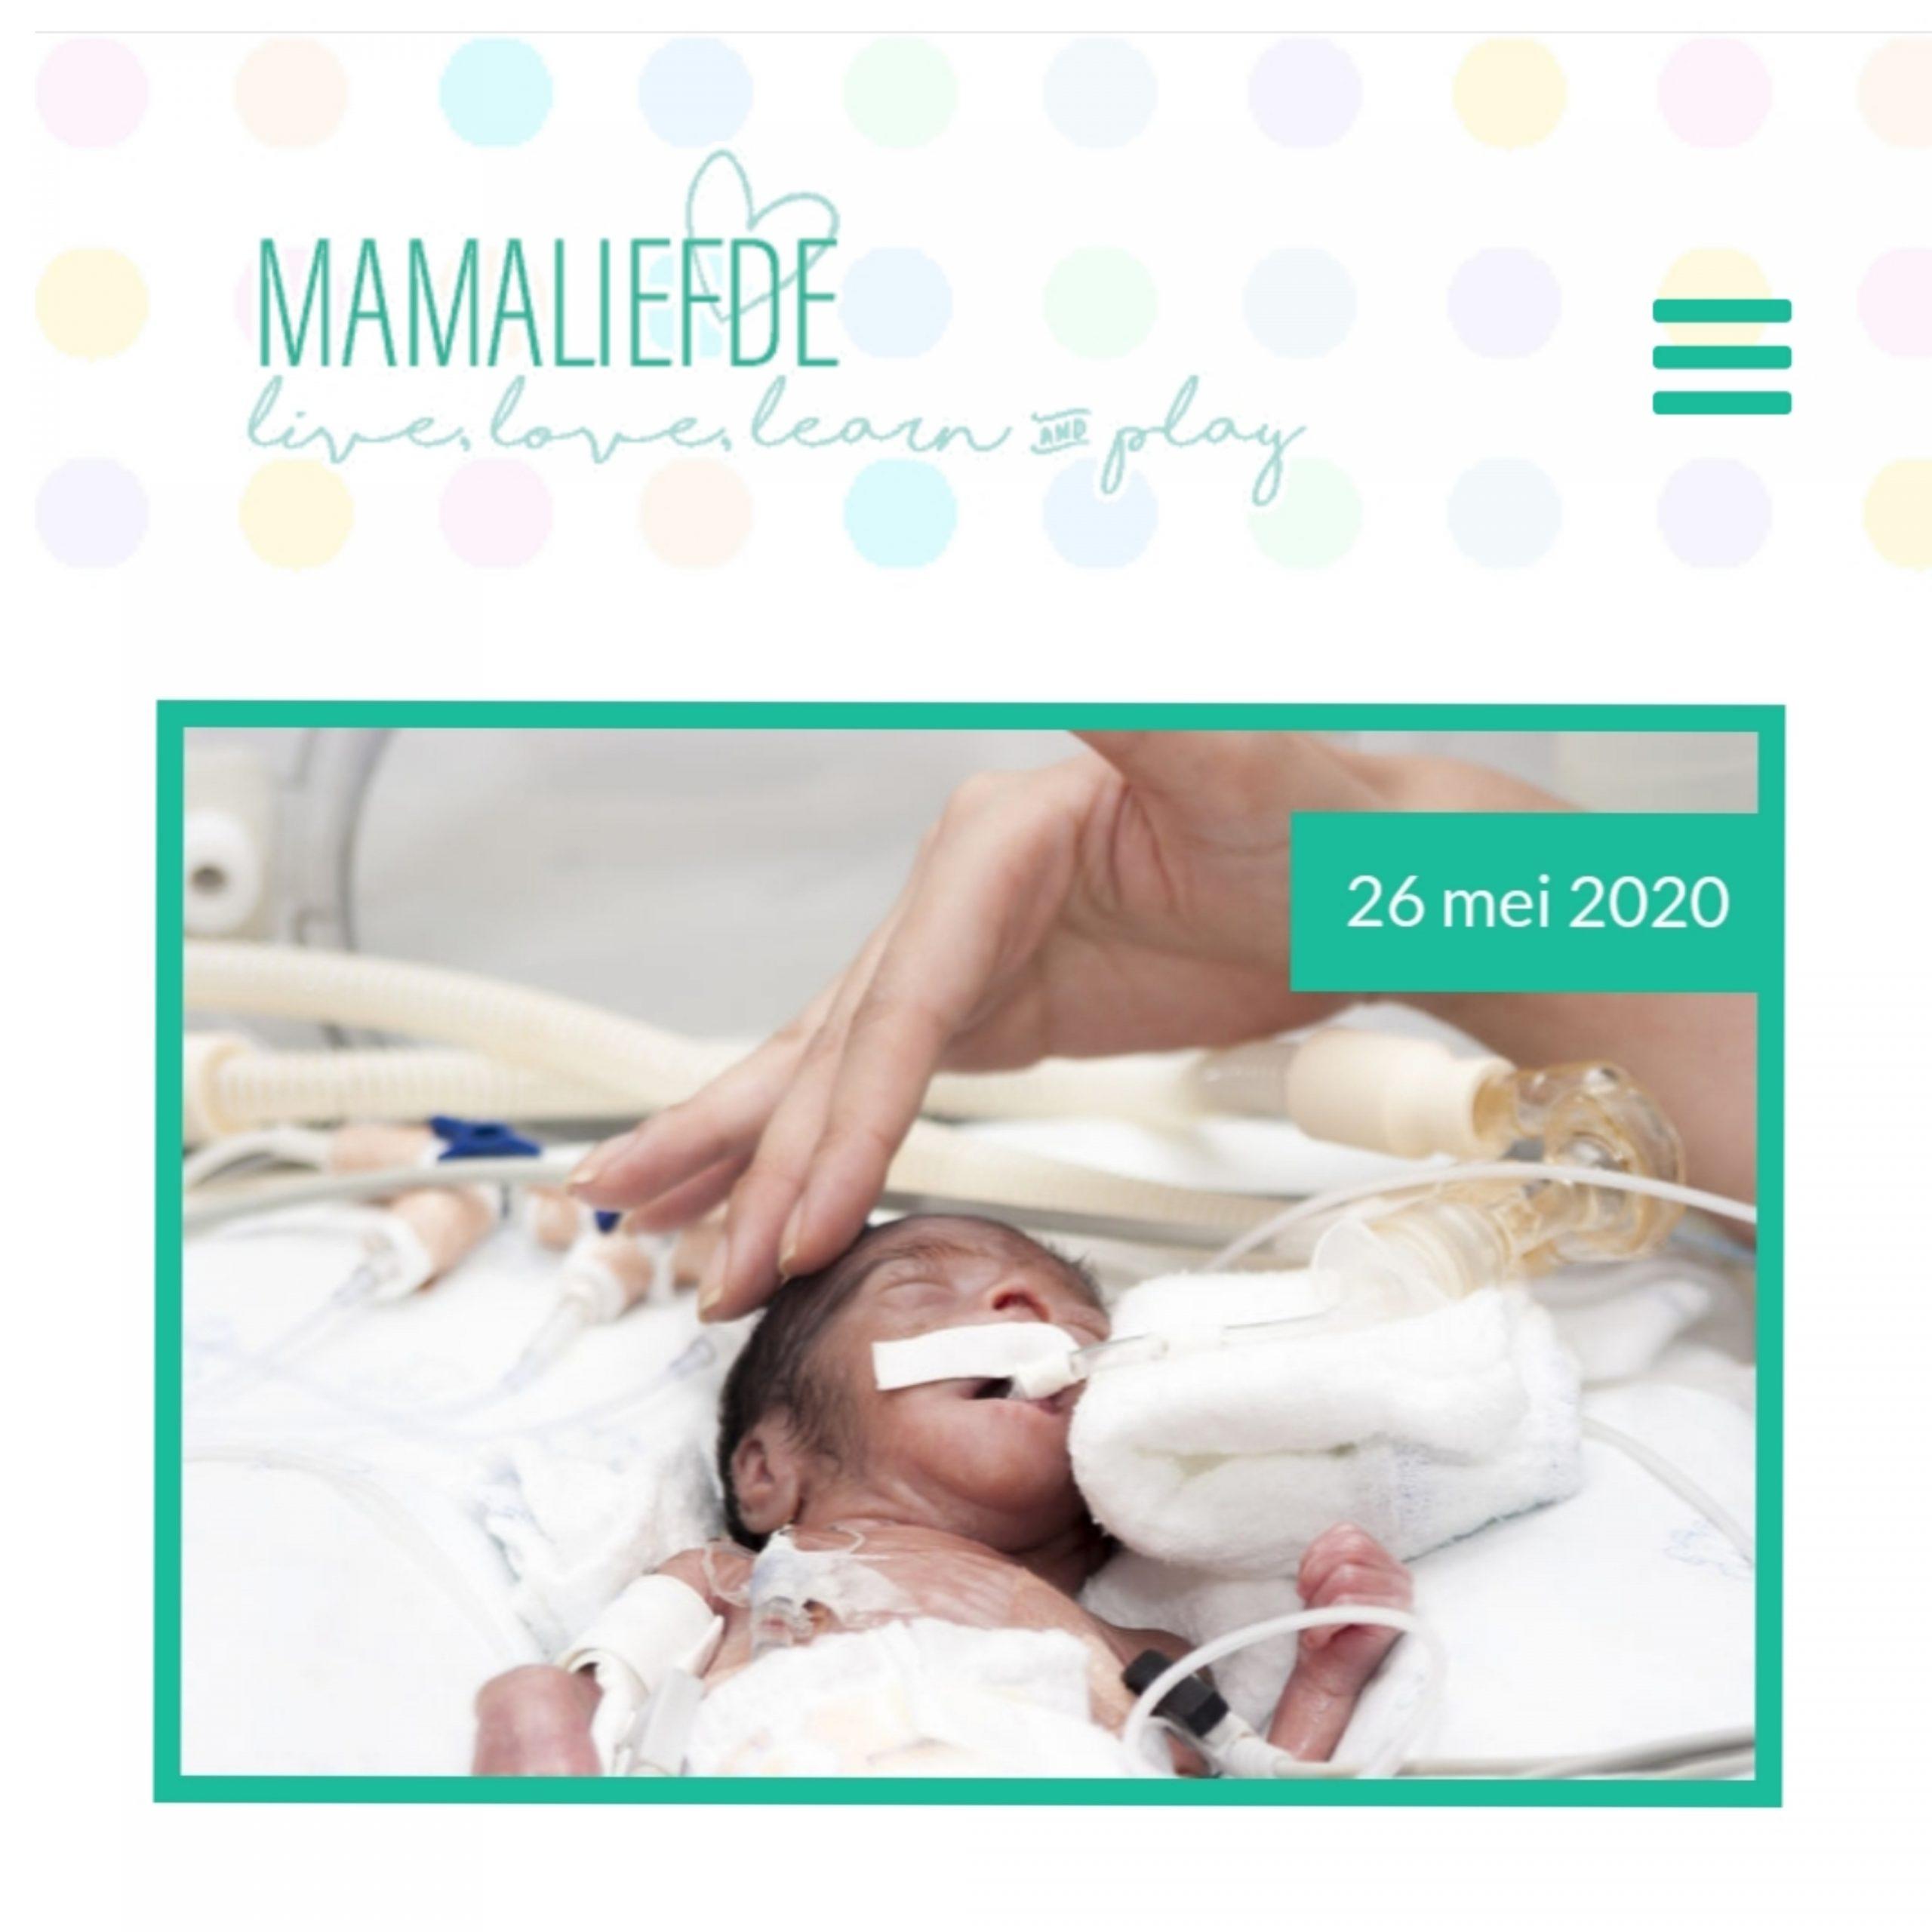 Mamaliefde.nl